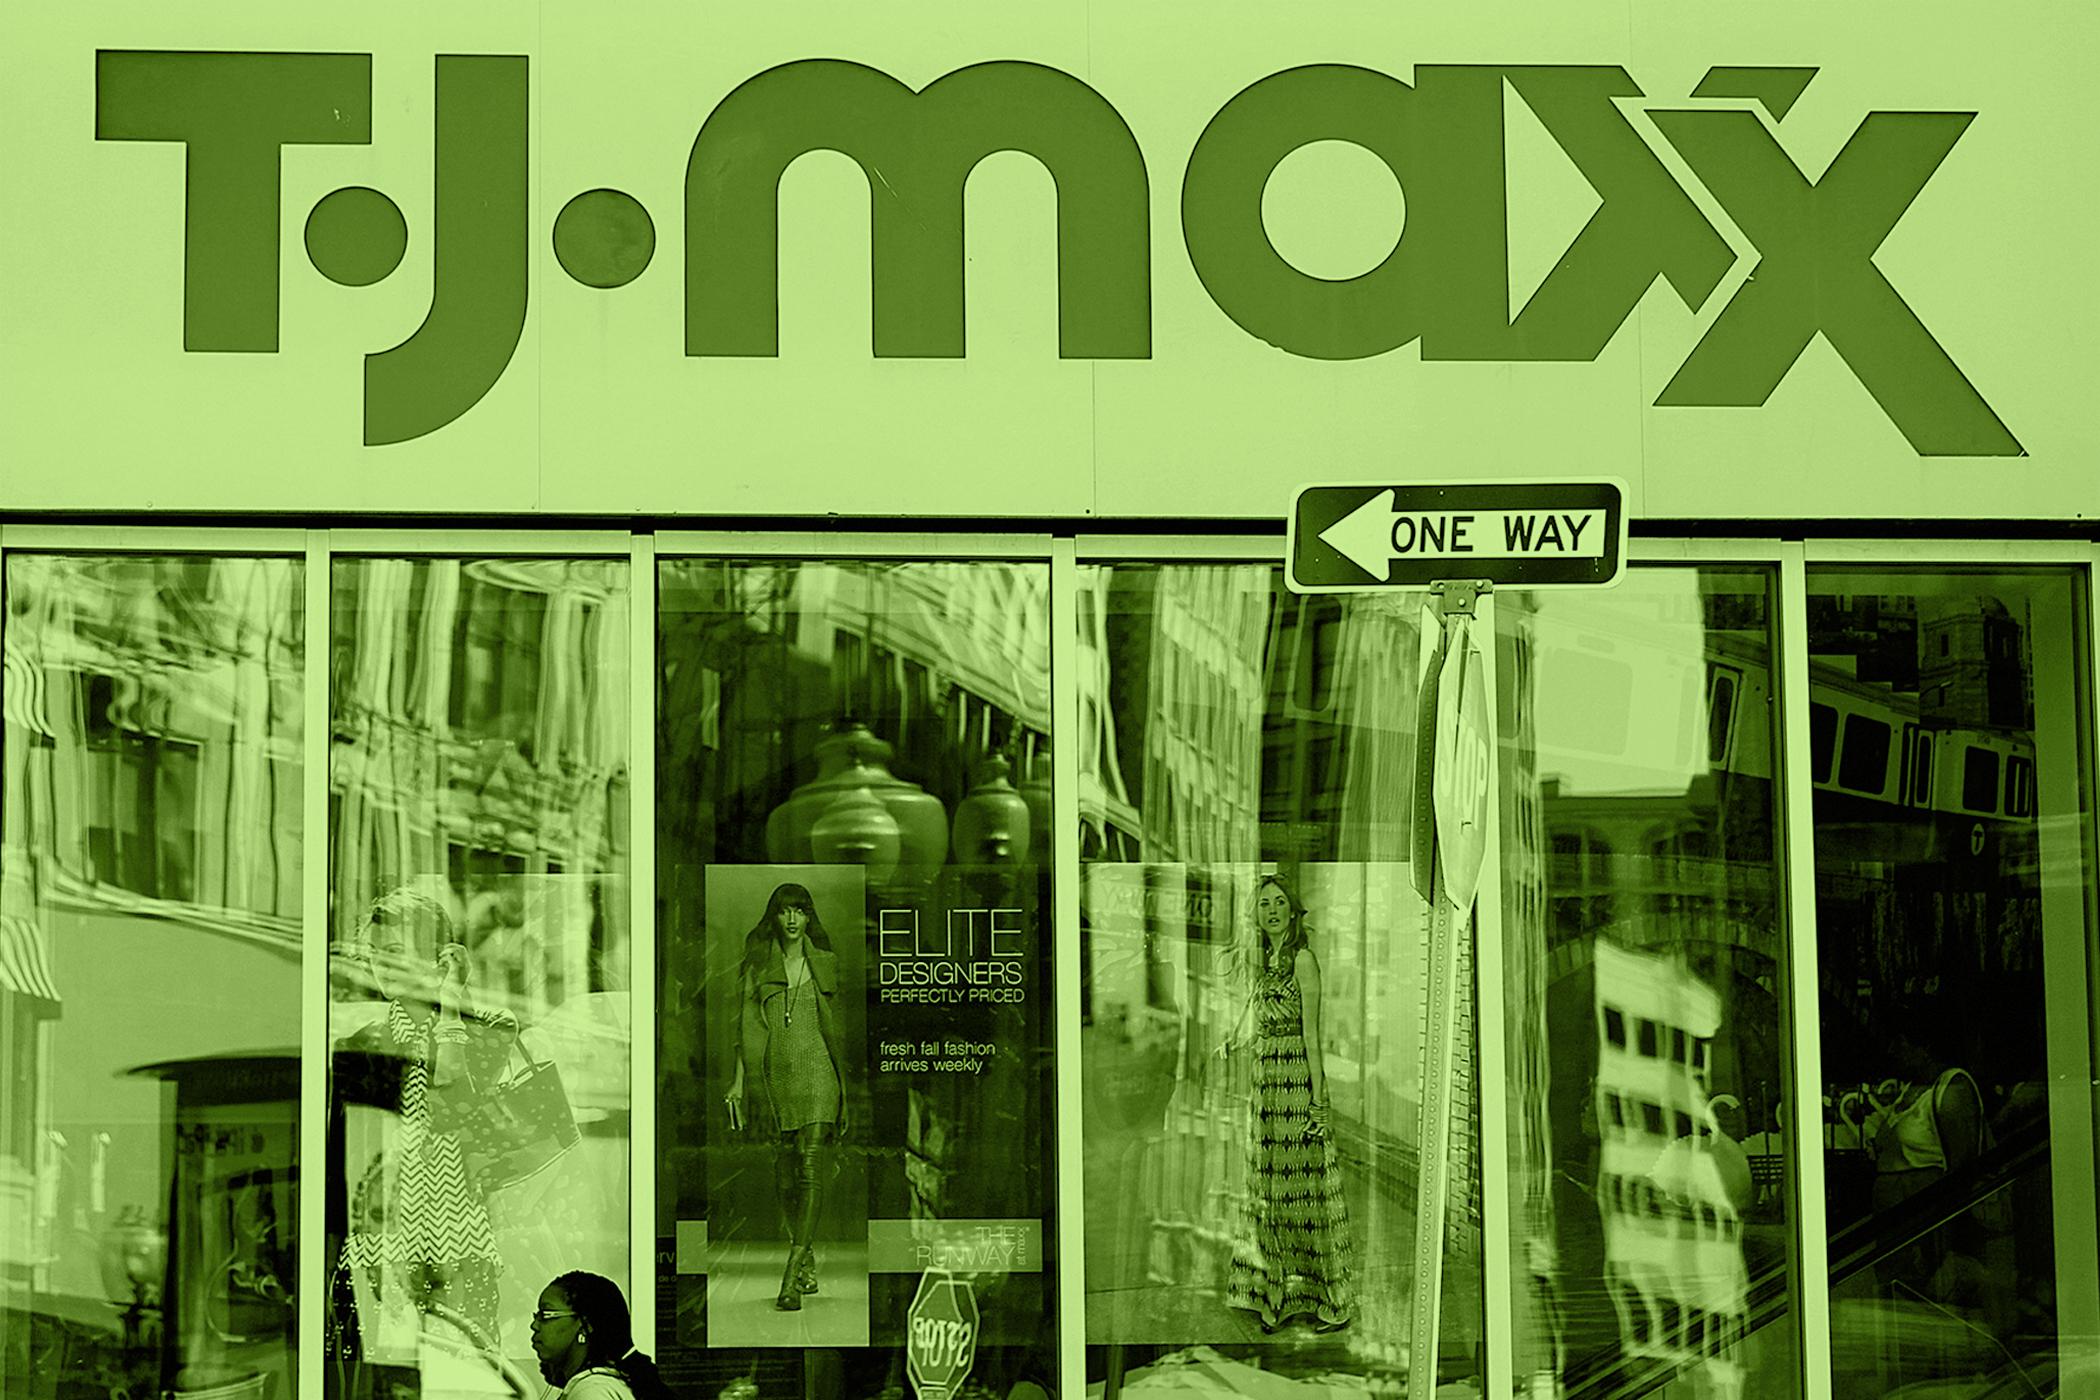 T.J. Maxx in Boston's Downtown Crossing, September 11, 2013.